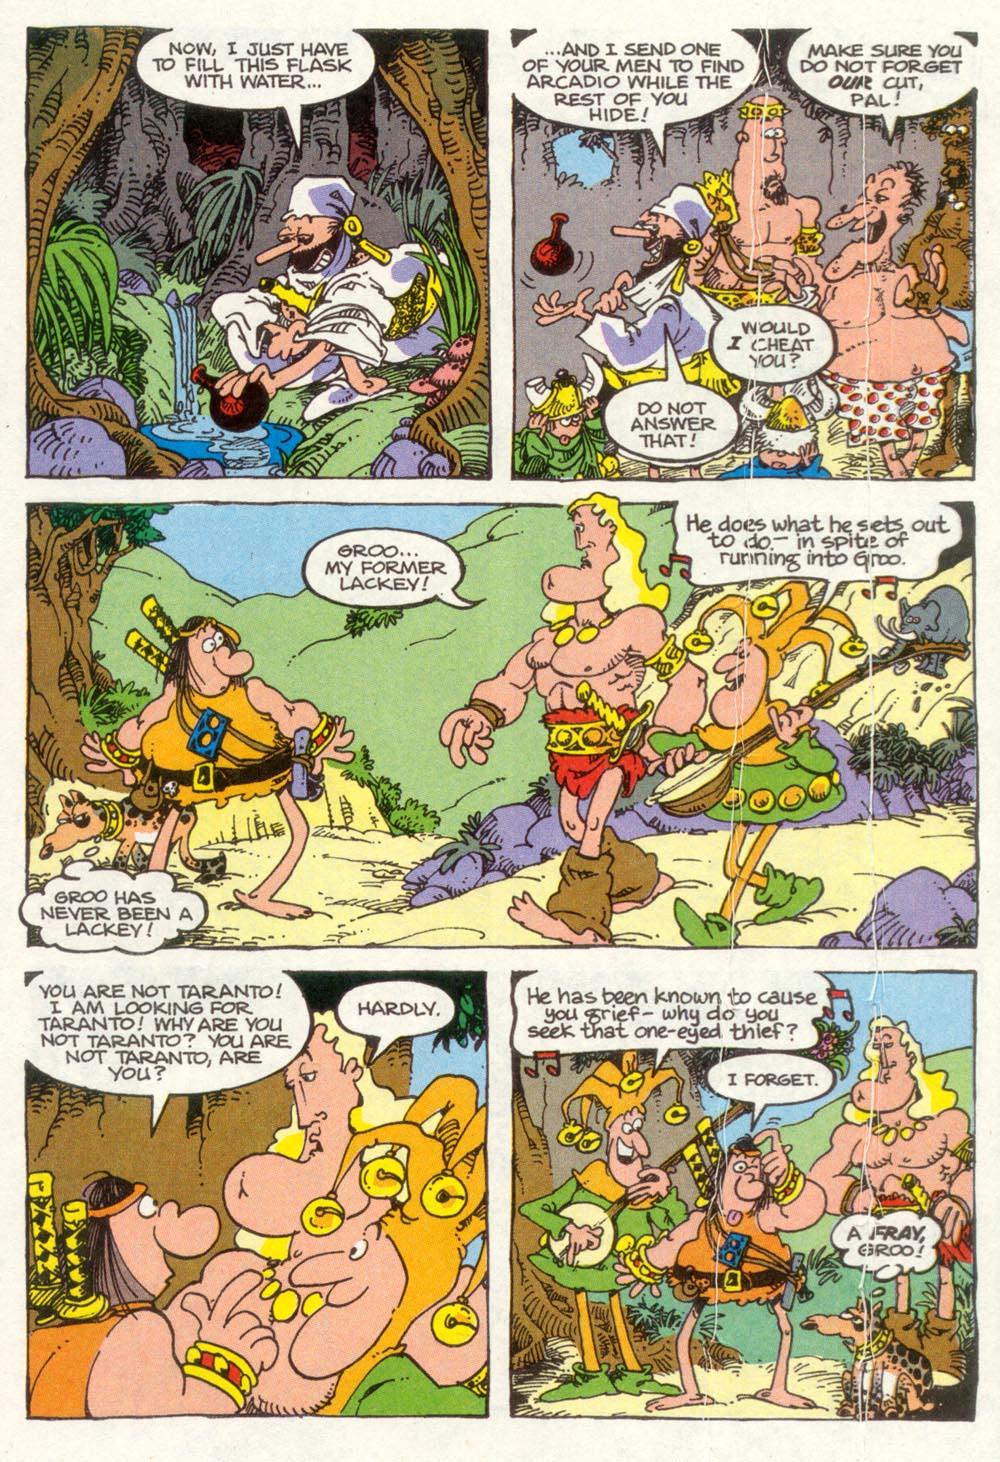 Read online Sergio Aragonés Groo the Wanderer comic -  Issue #92 - 11